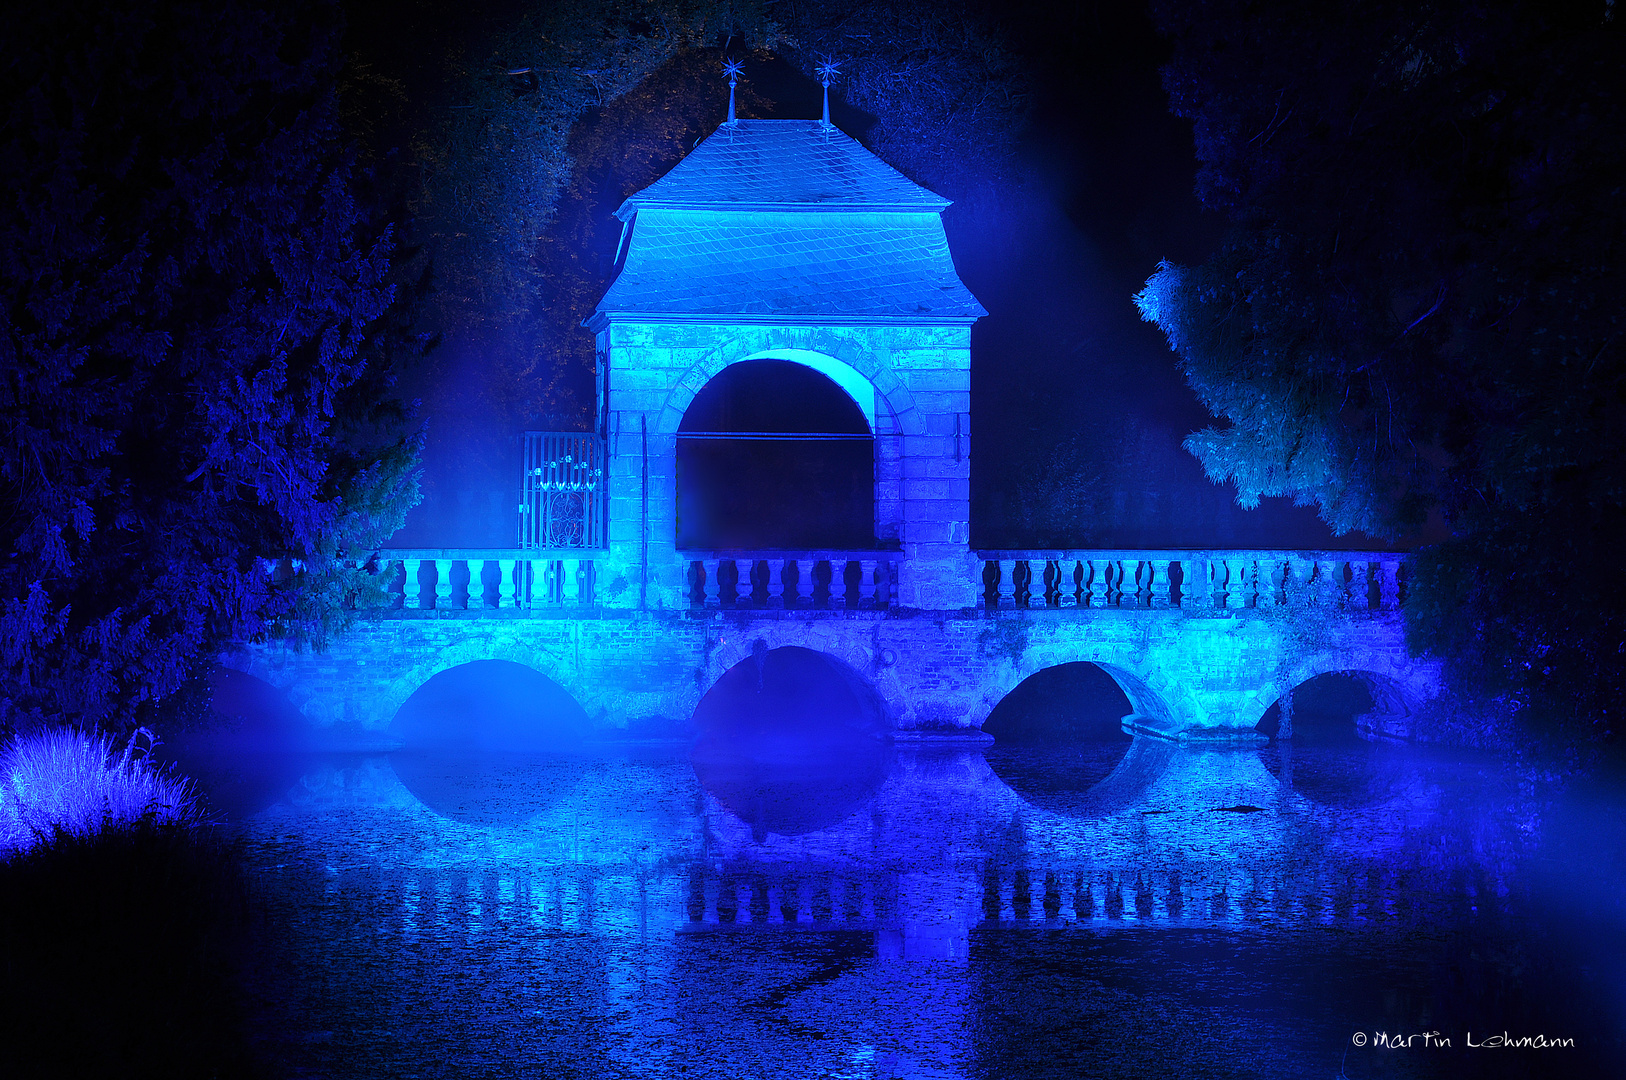 Hochzeitsbrücke II